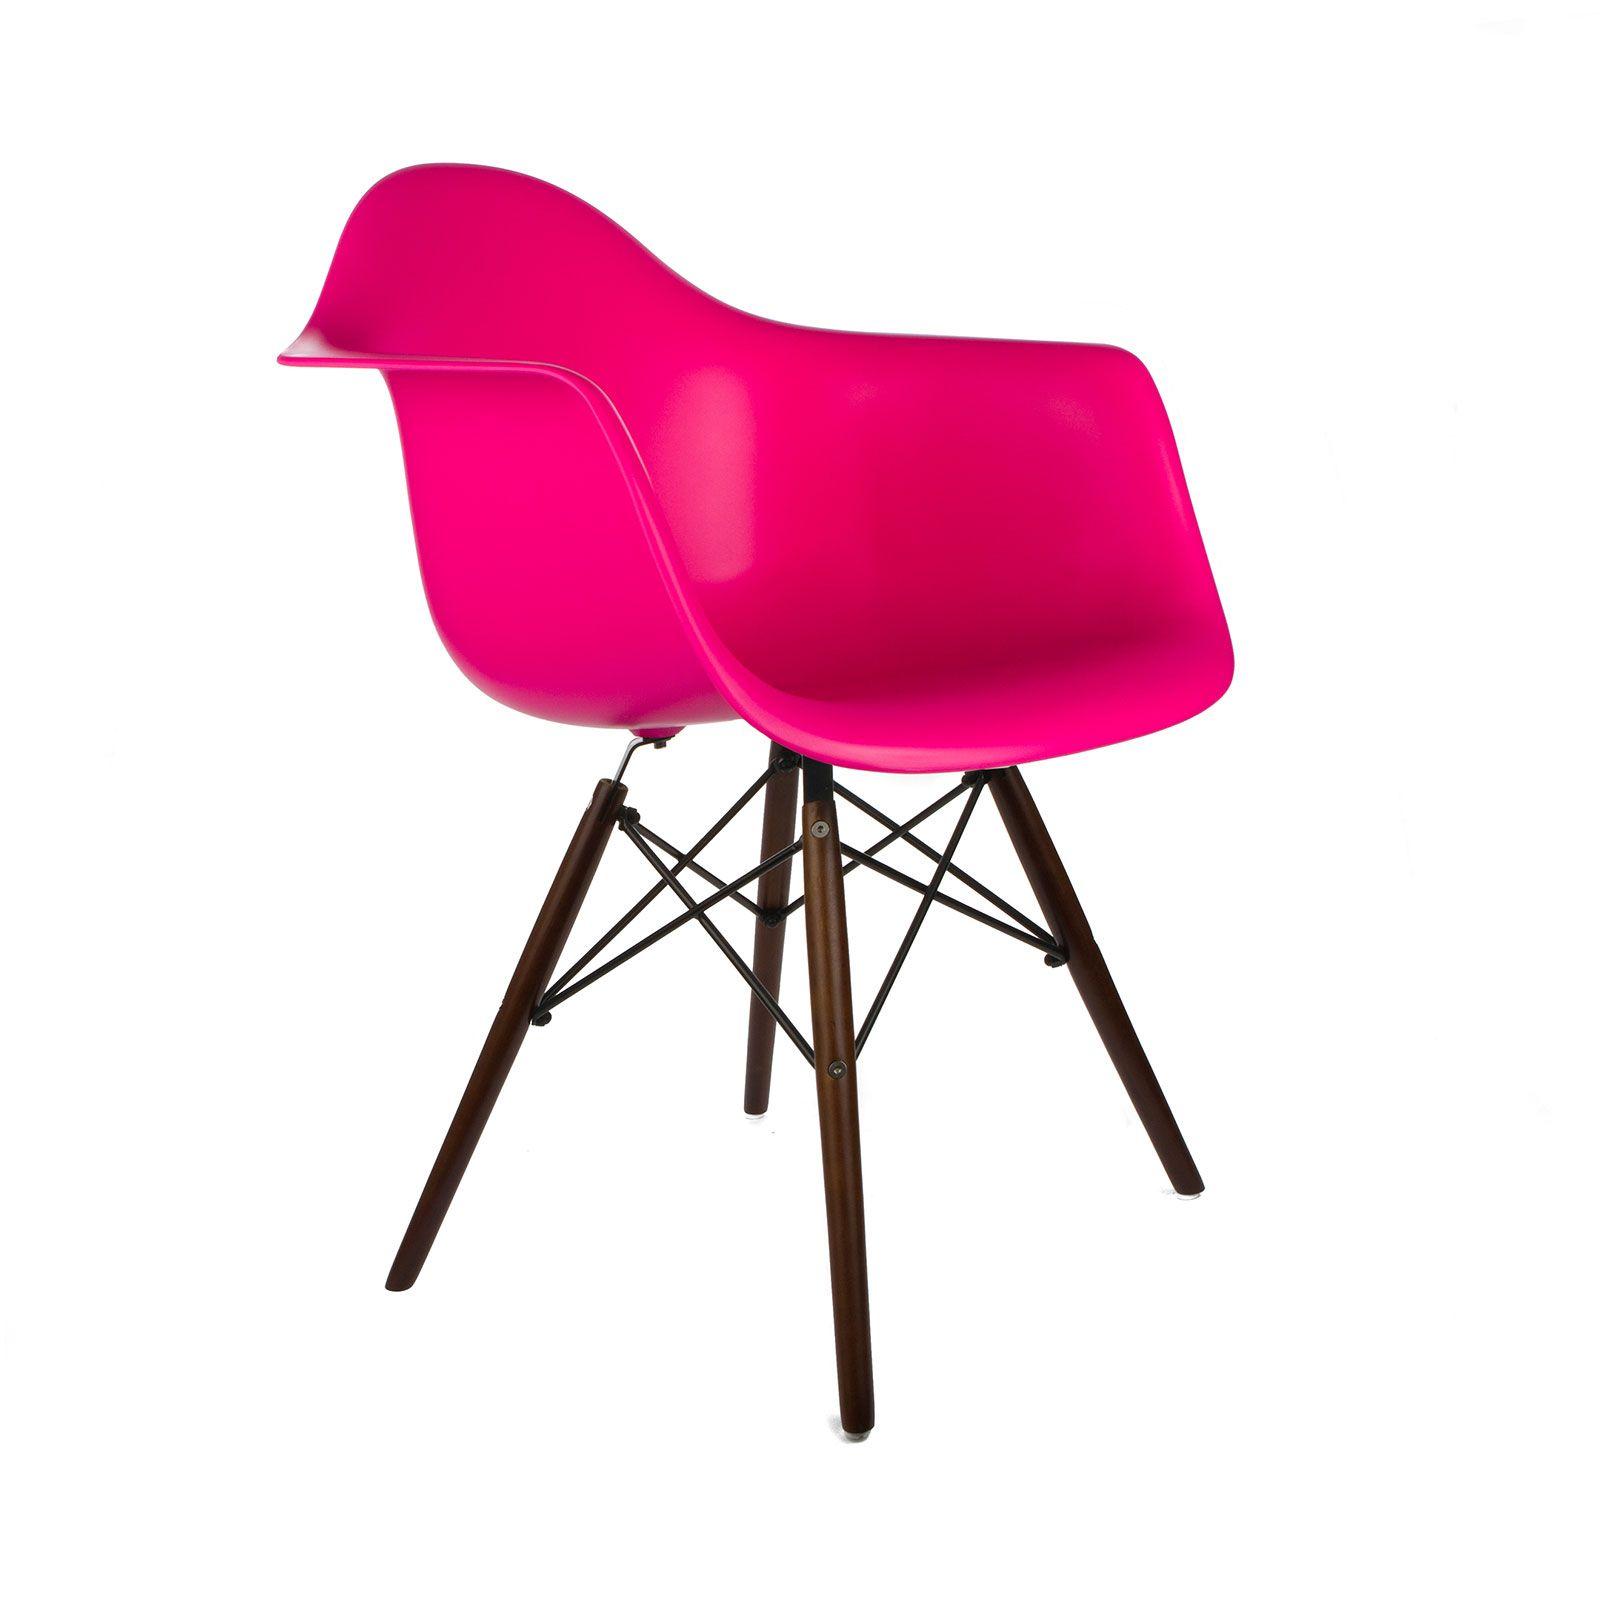 Walnut Montmartre Arm Chair in Fuchsia | dotandbo.com